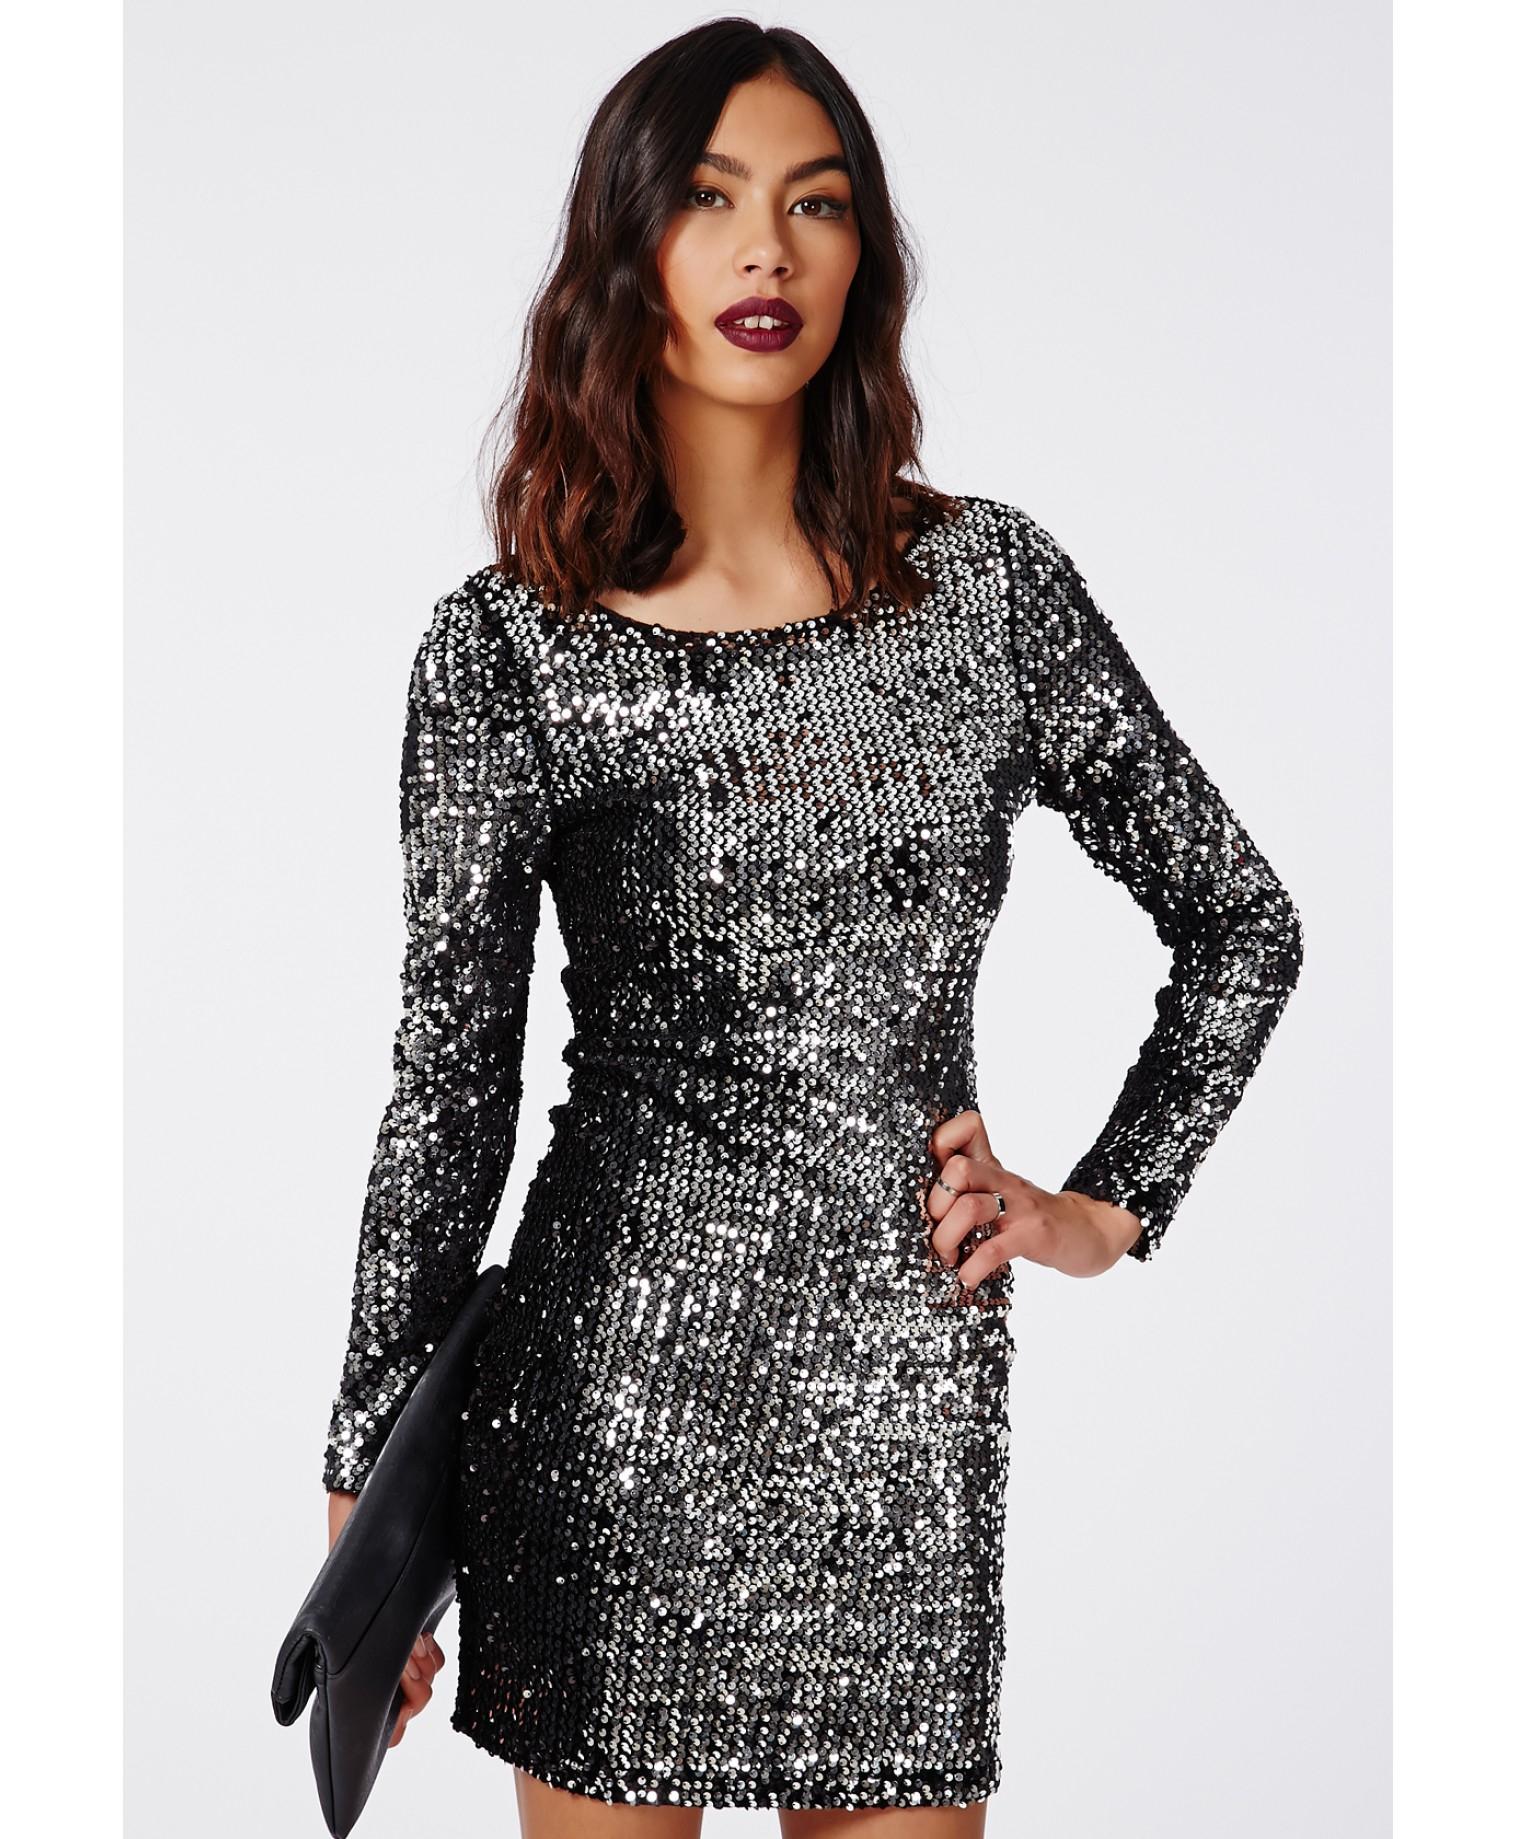 Black Sequin Long Sleeve Mini Dress